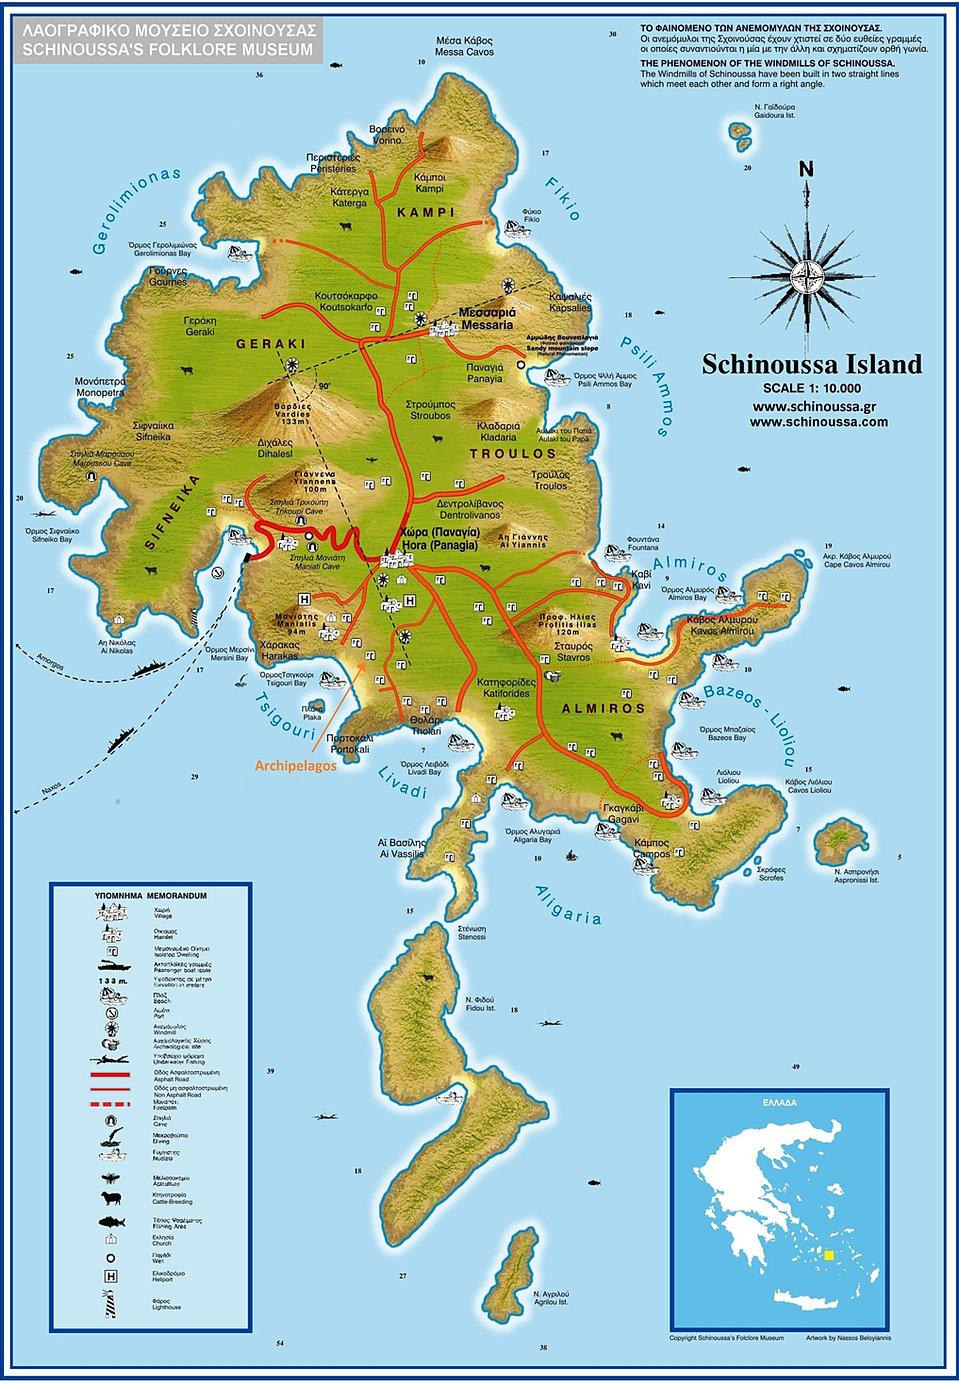 Schinoussa Island Map